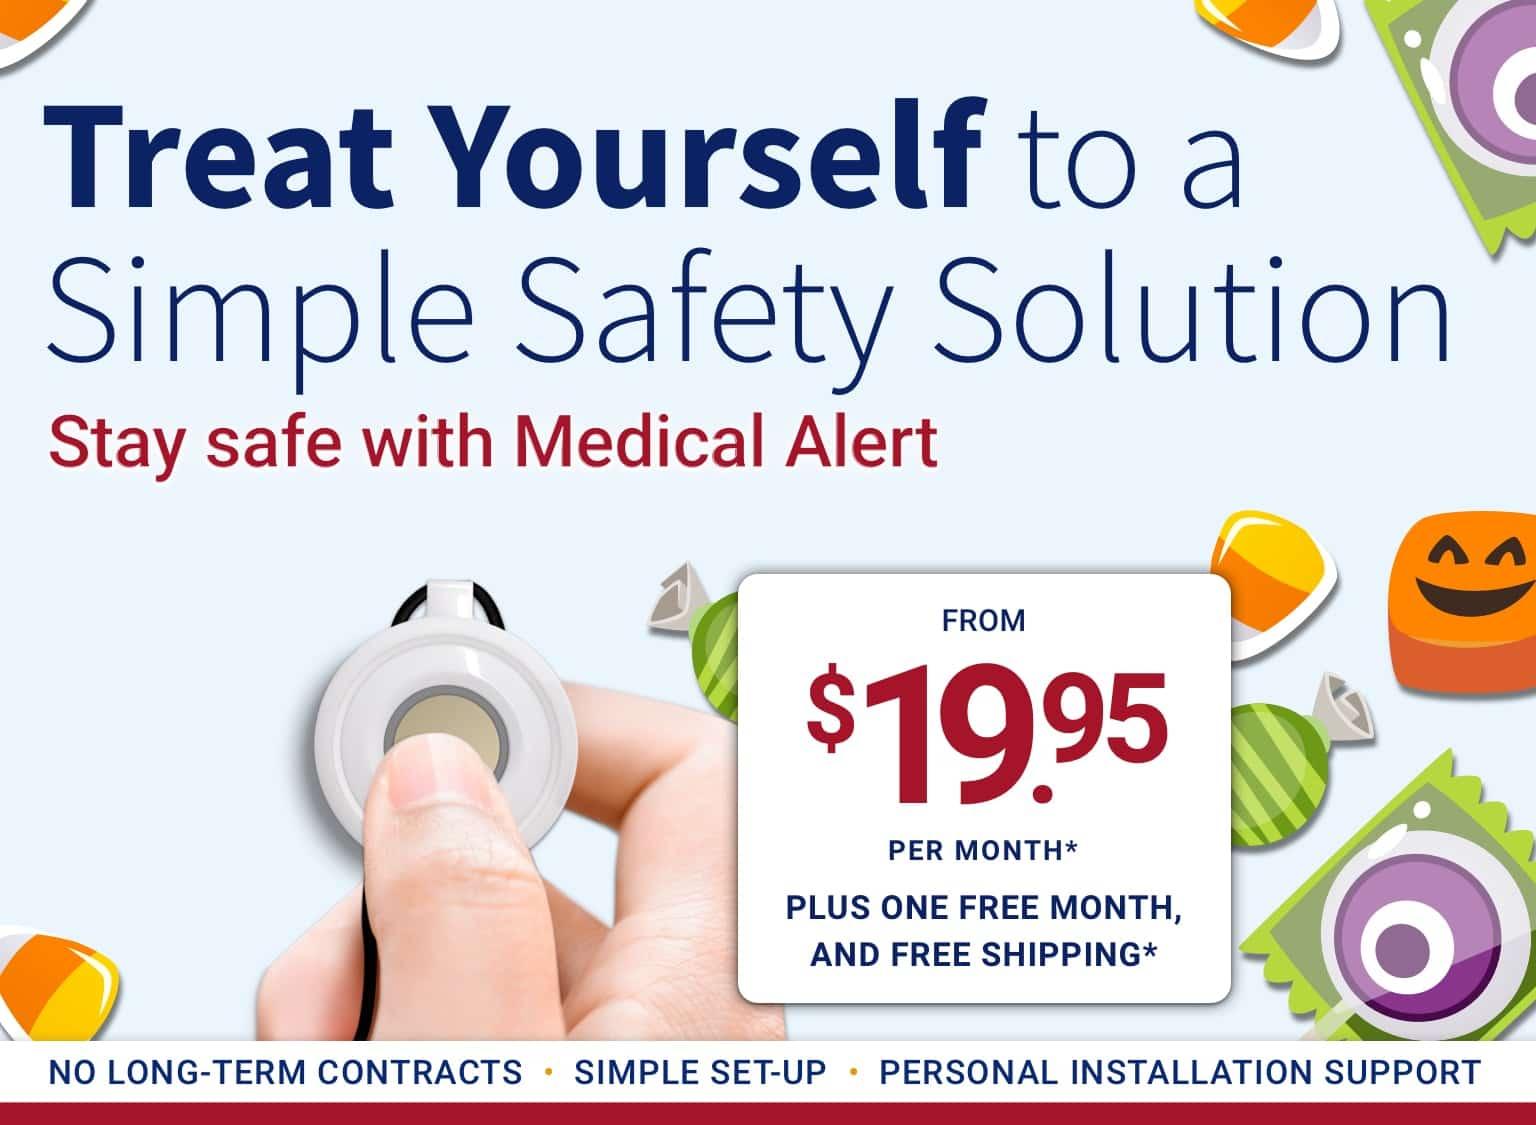 https://www.medicalalert.com/wp-content/uploads/2020/10/Mobile.jpg